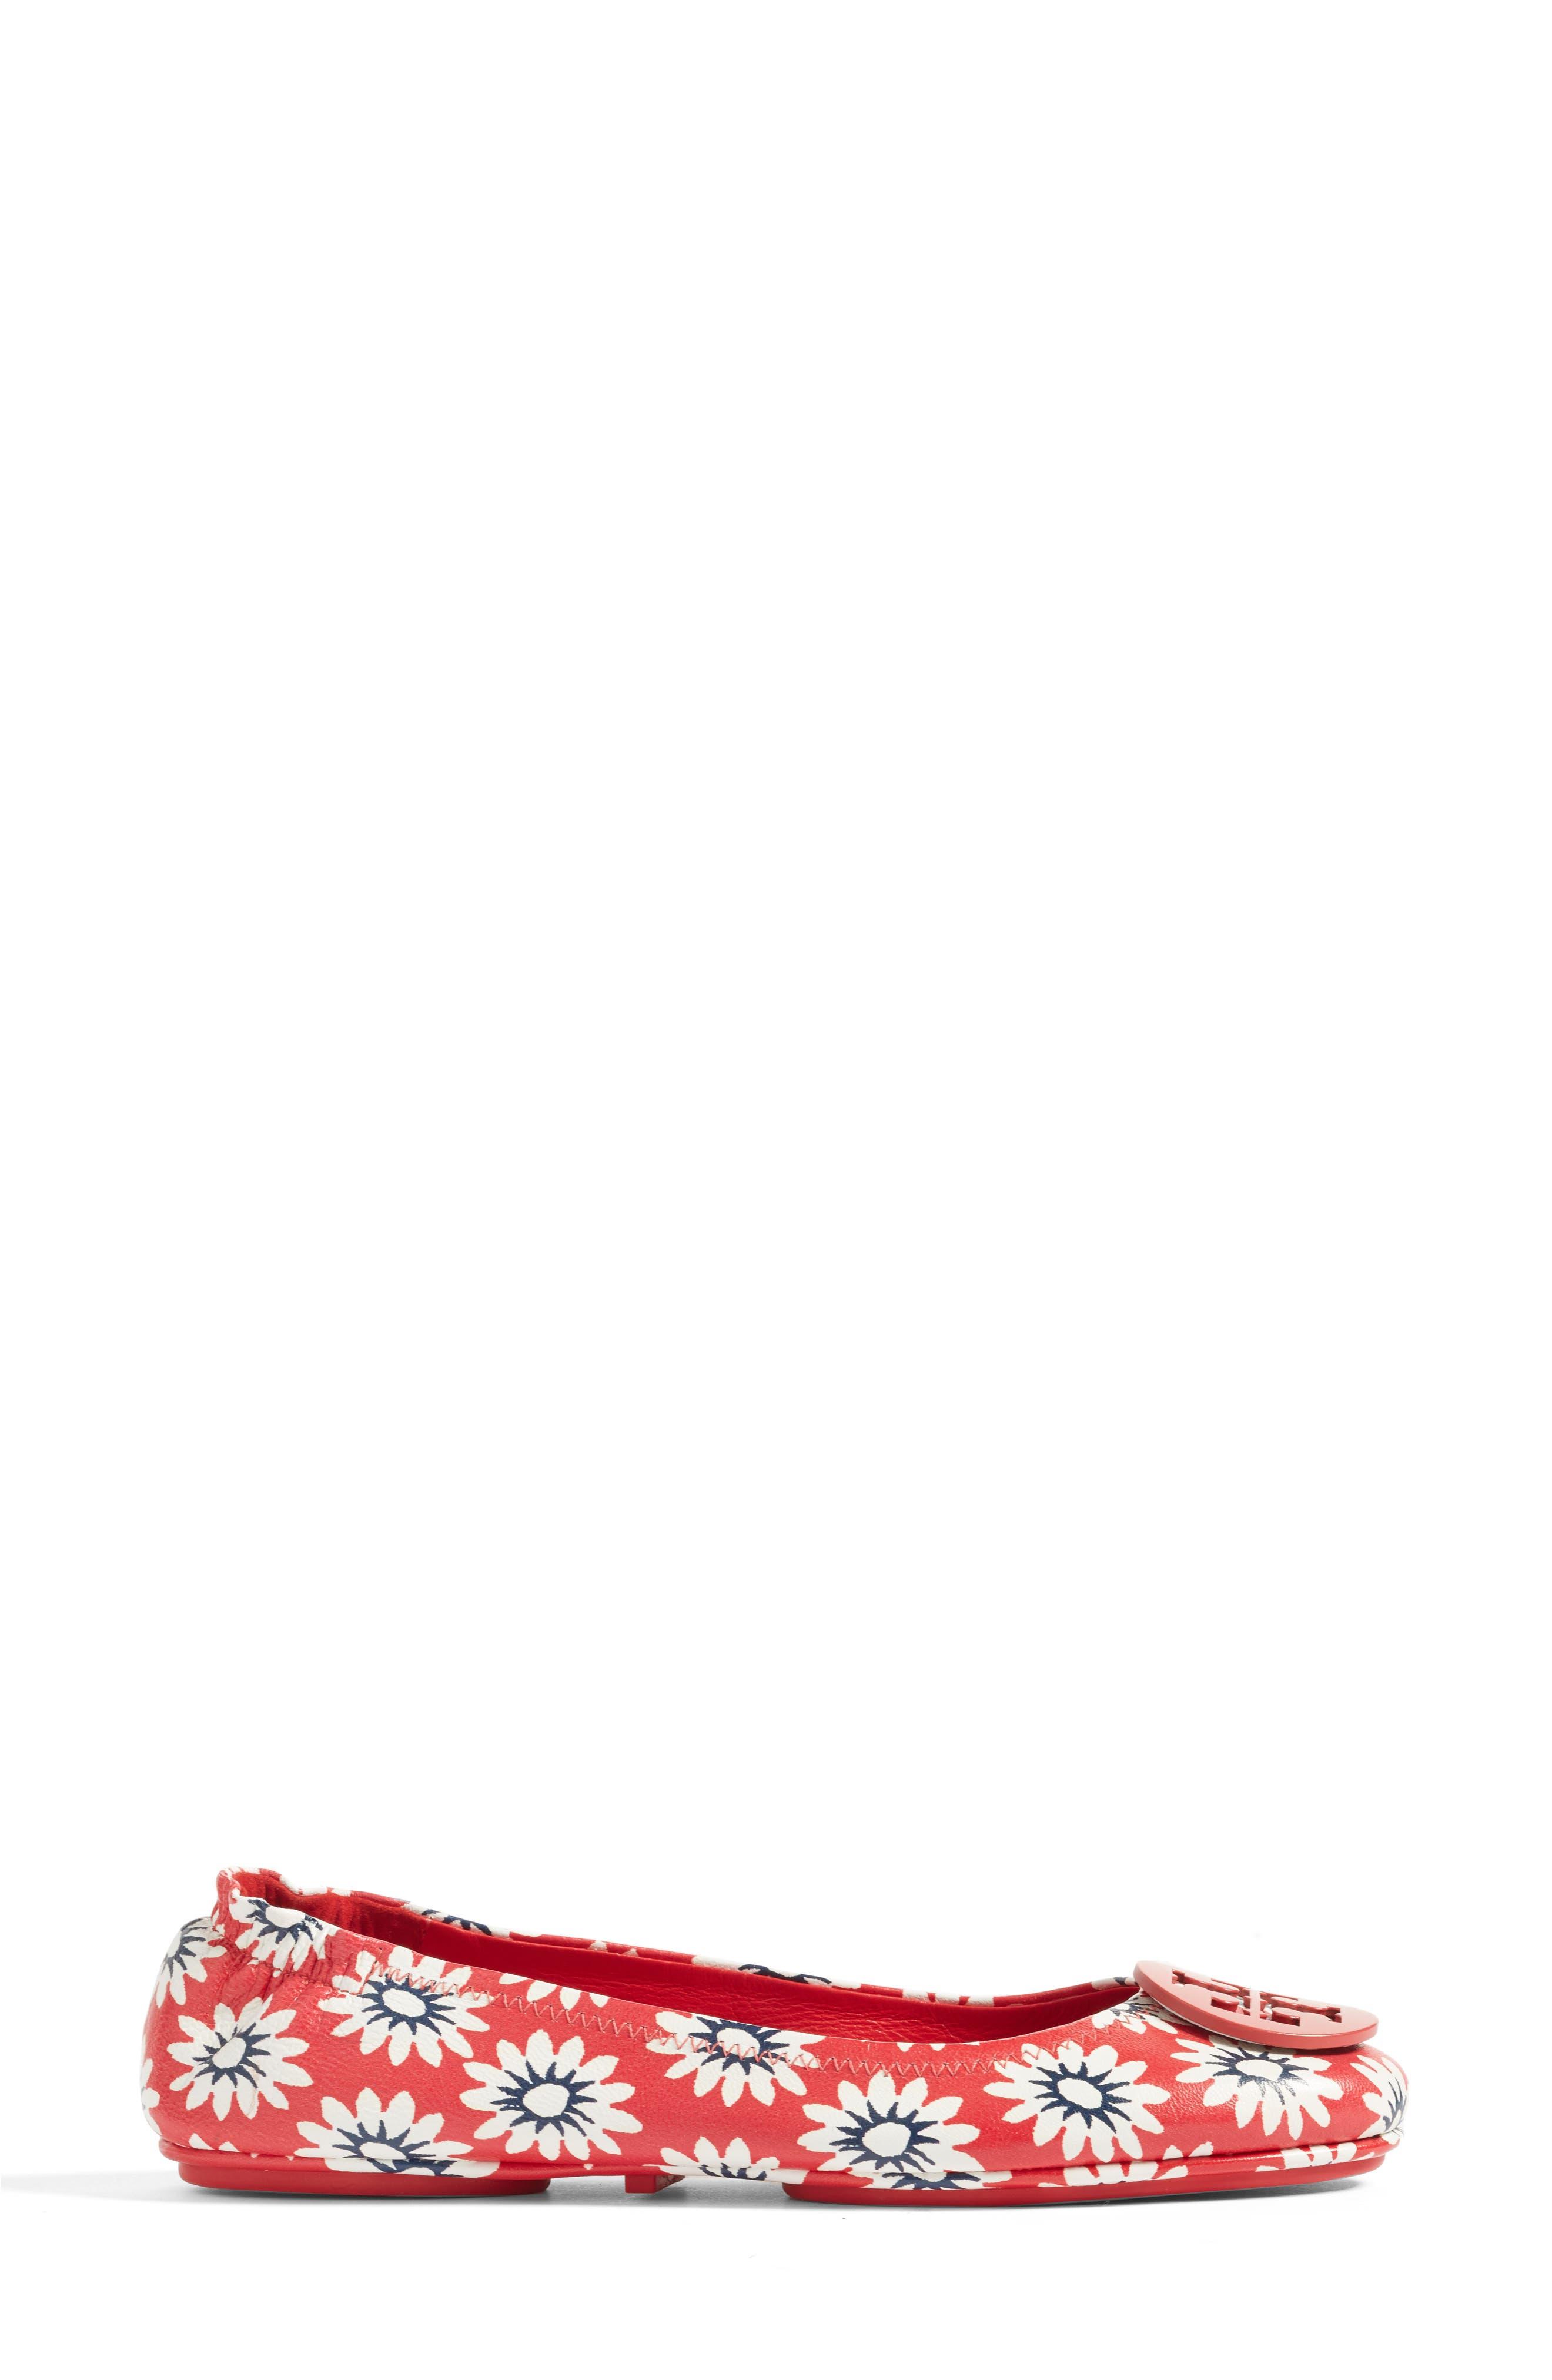 'Minnie' Travel Ballet Flat,                             Alternate thumbnail 265, color,